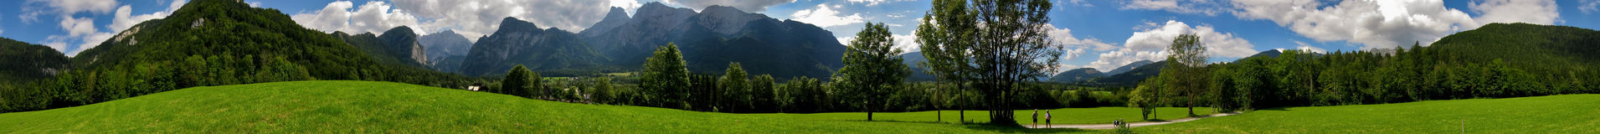 Alpen biketrip Panorama Lizenzfreie Stockfotos